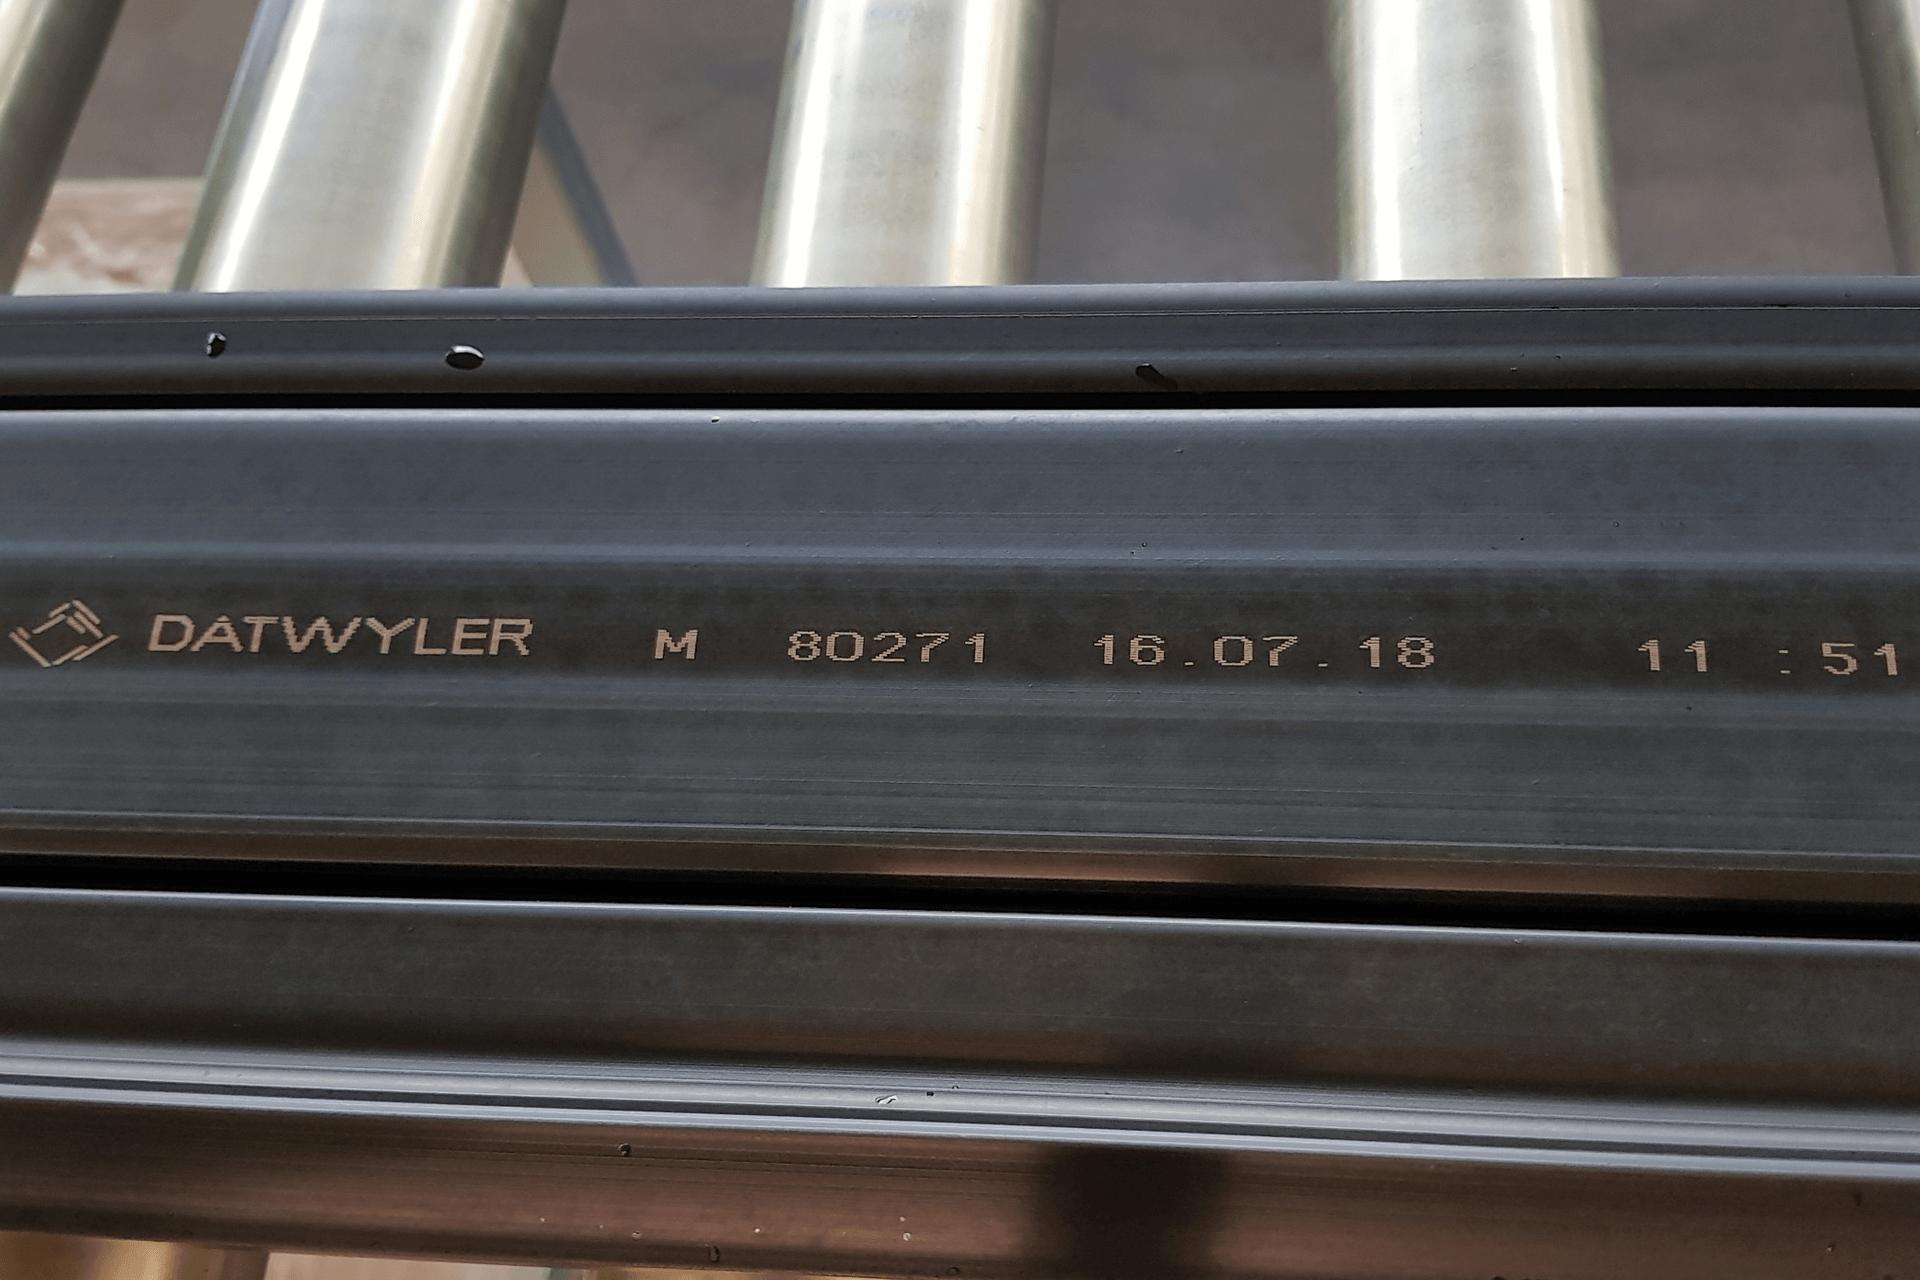 alphaJET Continuous Inkjet Print Date Time Datwyler Seaing Technologies PrintSafe